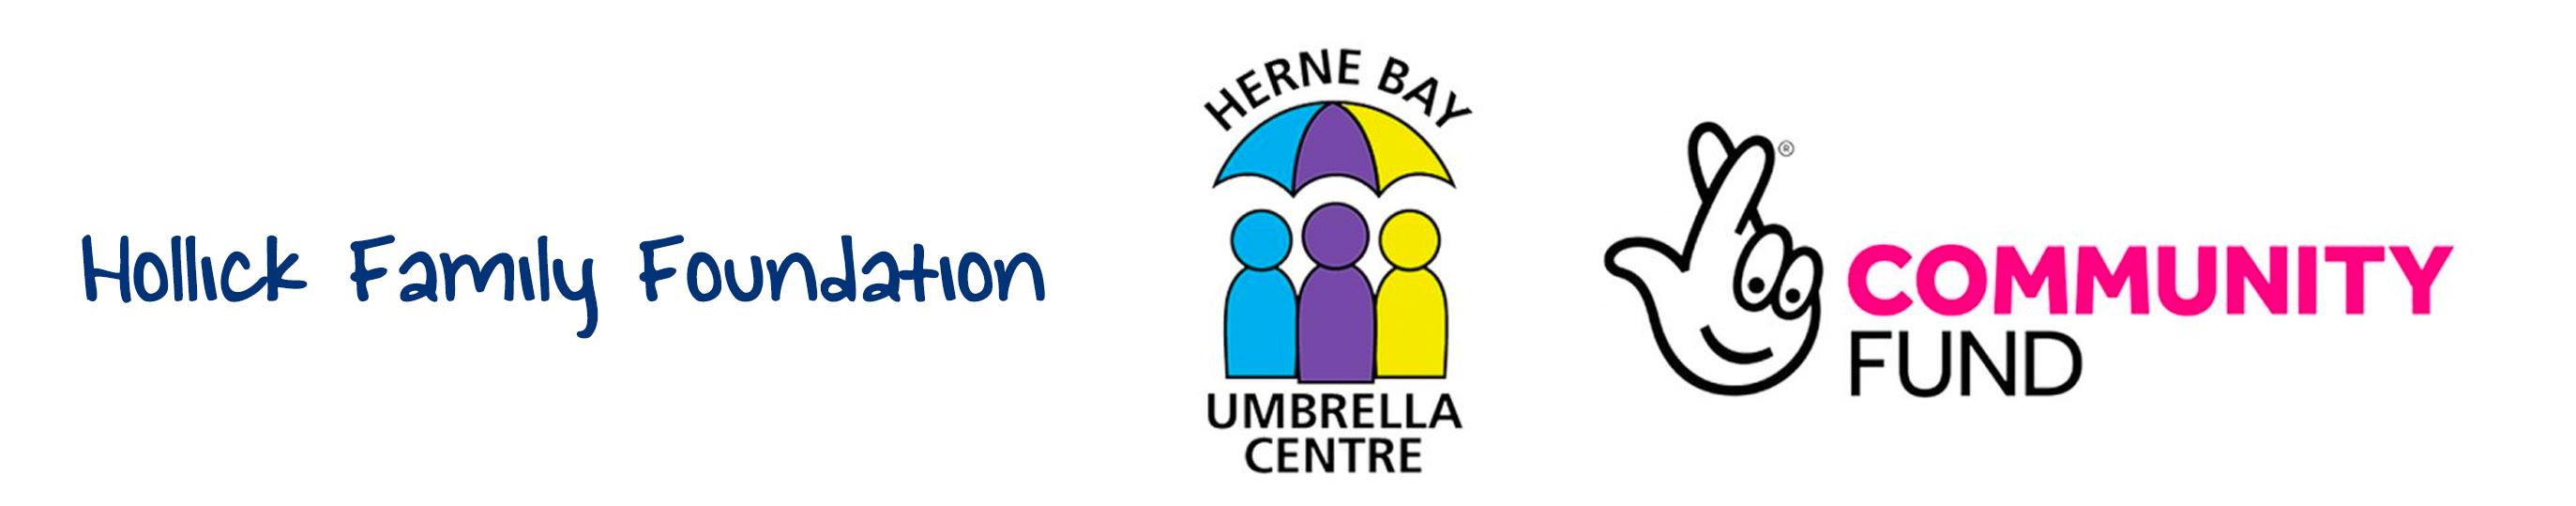 Mental Health Awareness - Umbrella Centre and Community Fund and Hollicks Family Foundation logos.